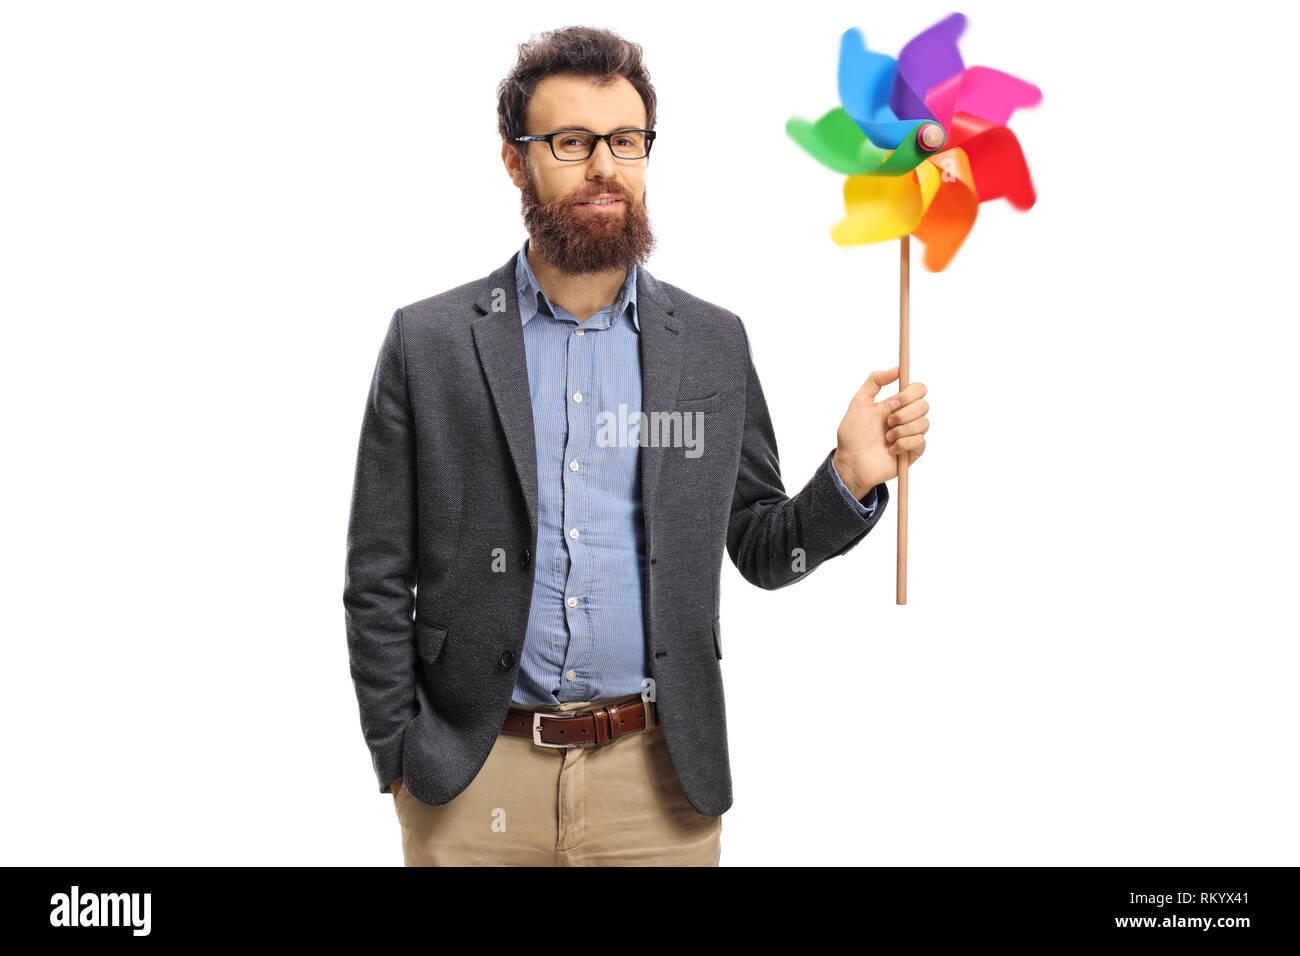 Bearded man holding a spinning pinwheel isolated on white background Stock Photo